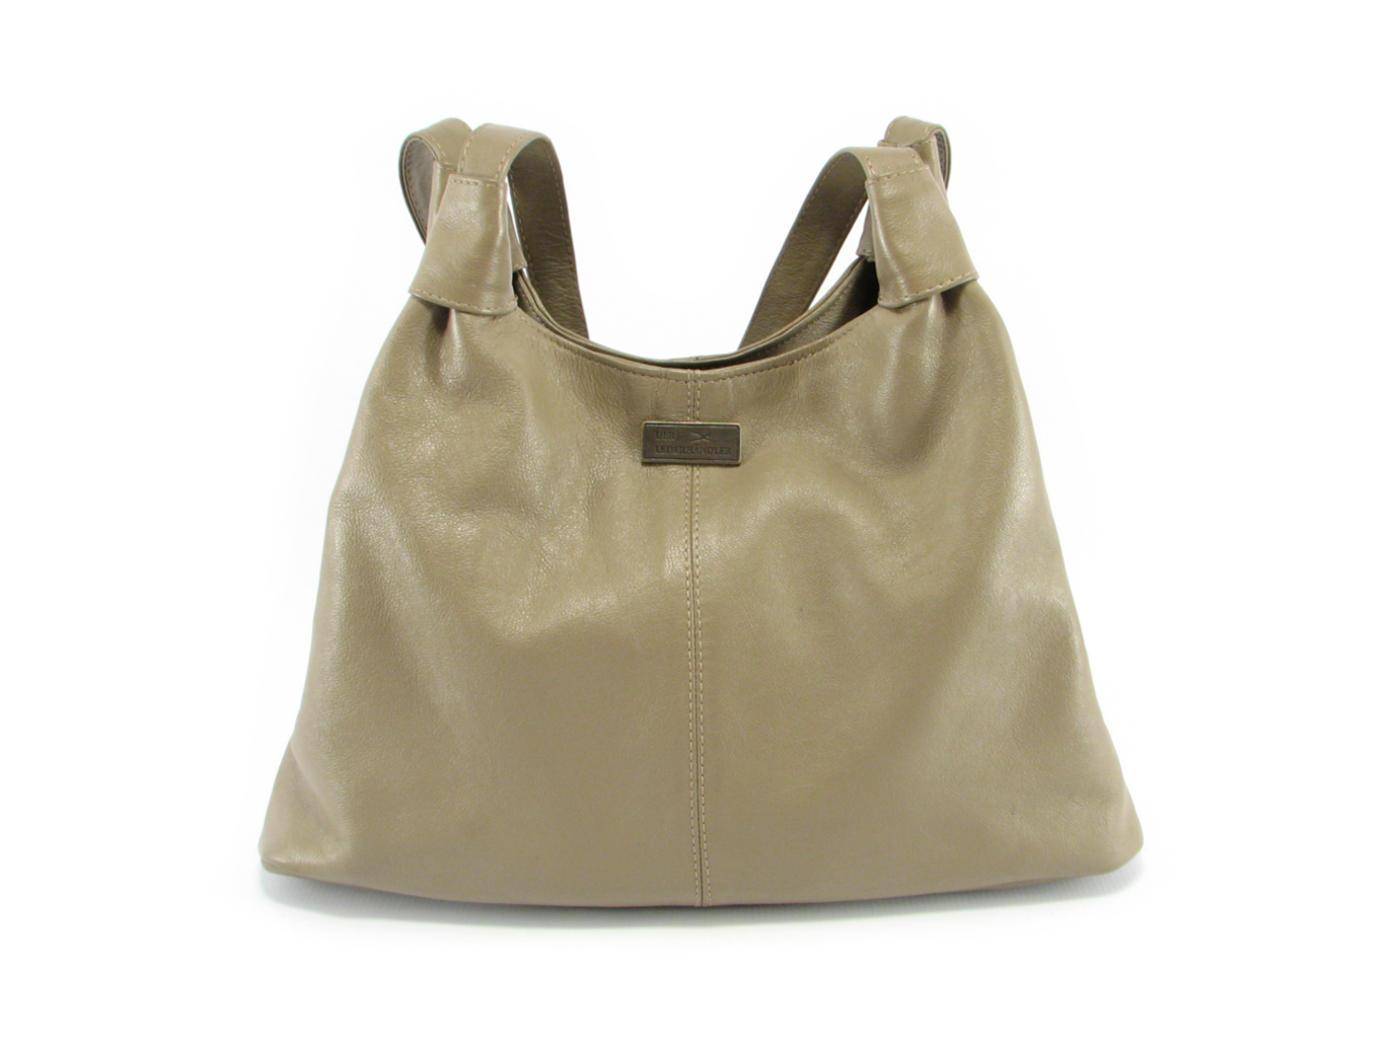 e6153f0c6353 Ashleigh Plain Small HP7133 front classic handbag leather bags women